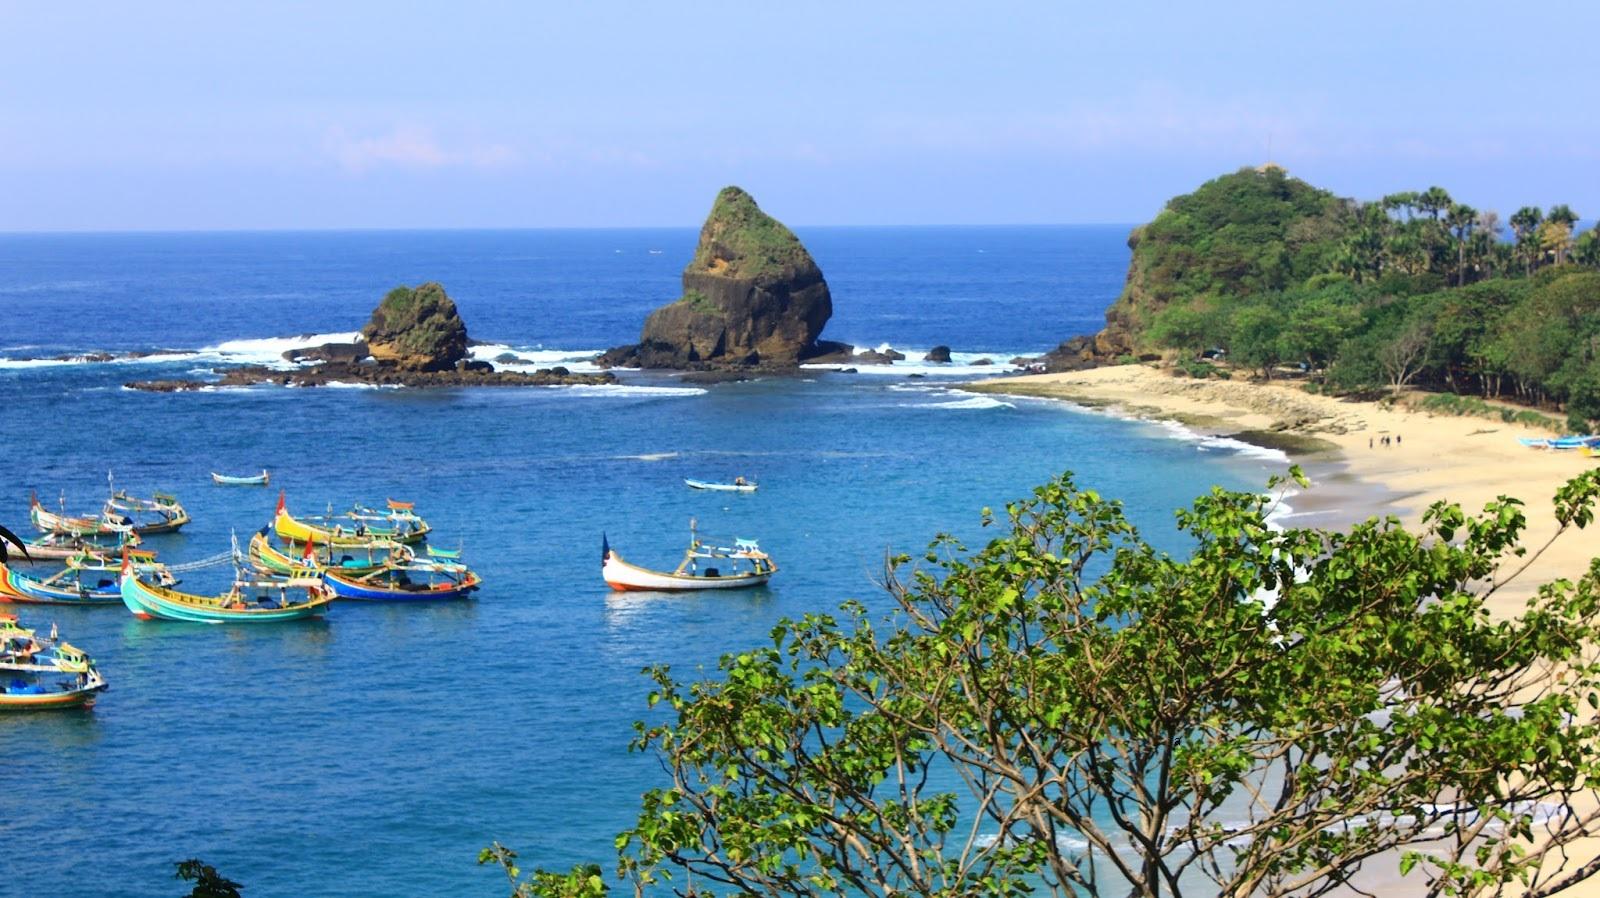 Pantai Papuma Jember Penuh Kejutan Alam Indah Aneka Wisata Seru